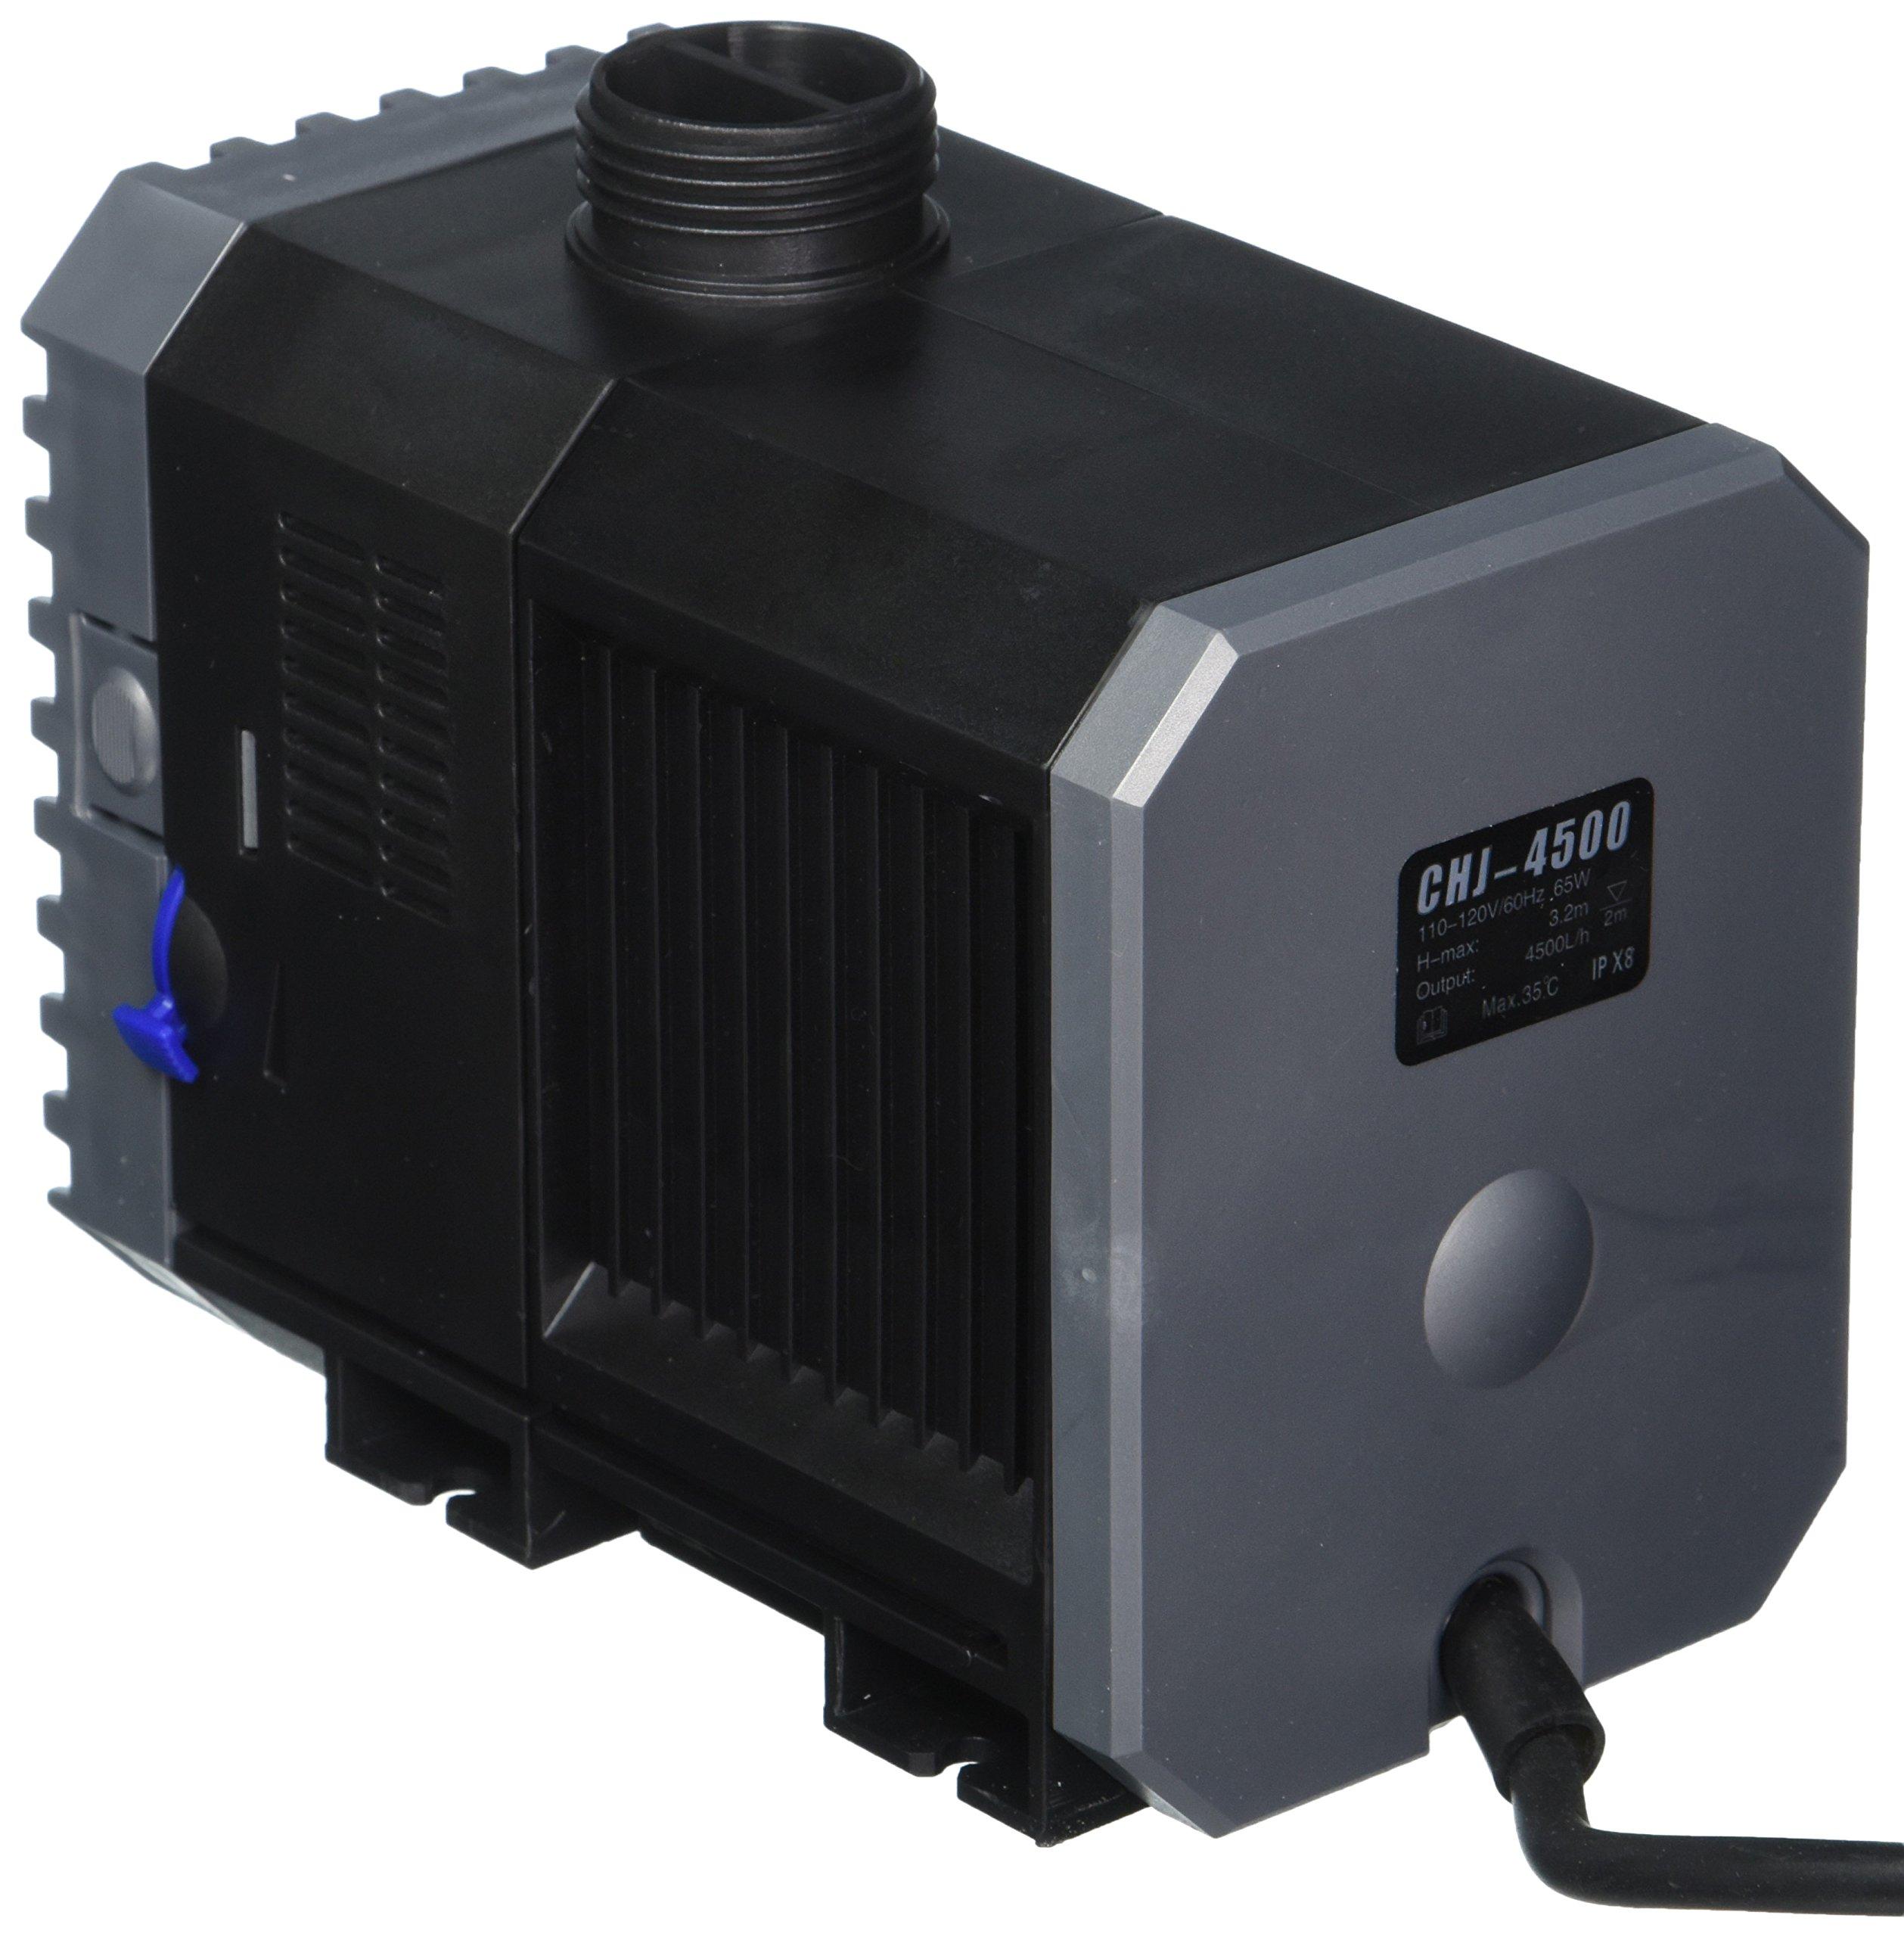 Tech'n'Toy Grech CHJ-4500 1188 GPH  Aquarium Submersible Fountain Pump by Tech'n'Toy (Image #2)